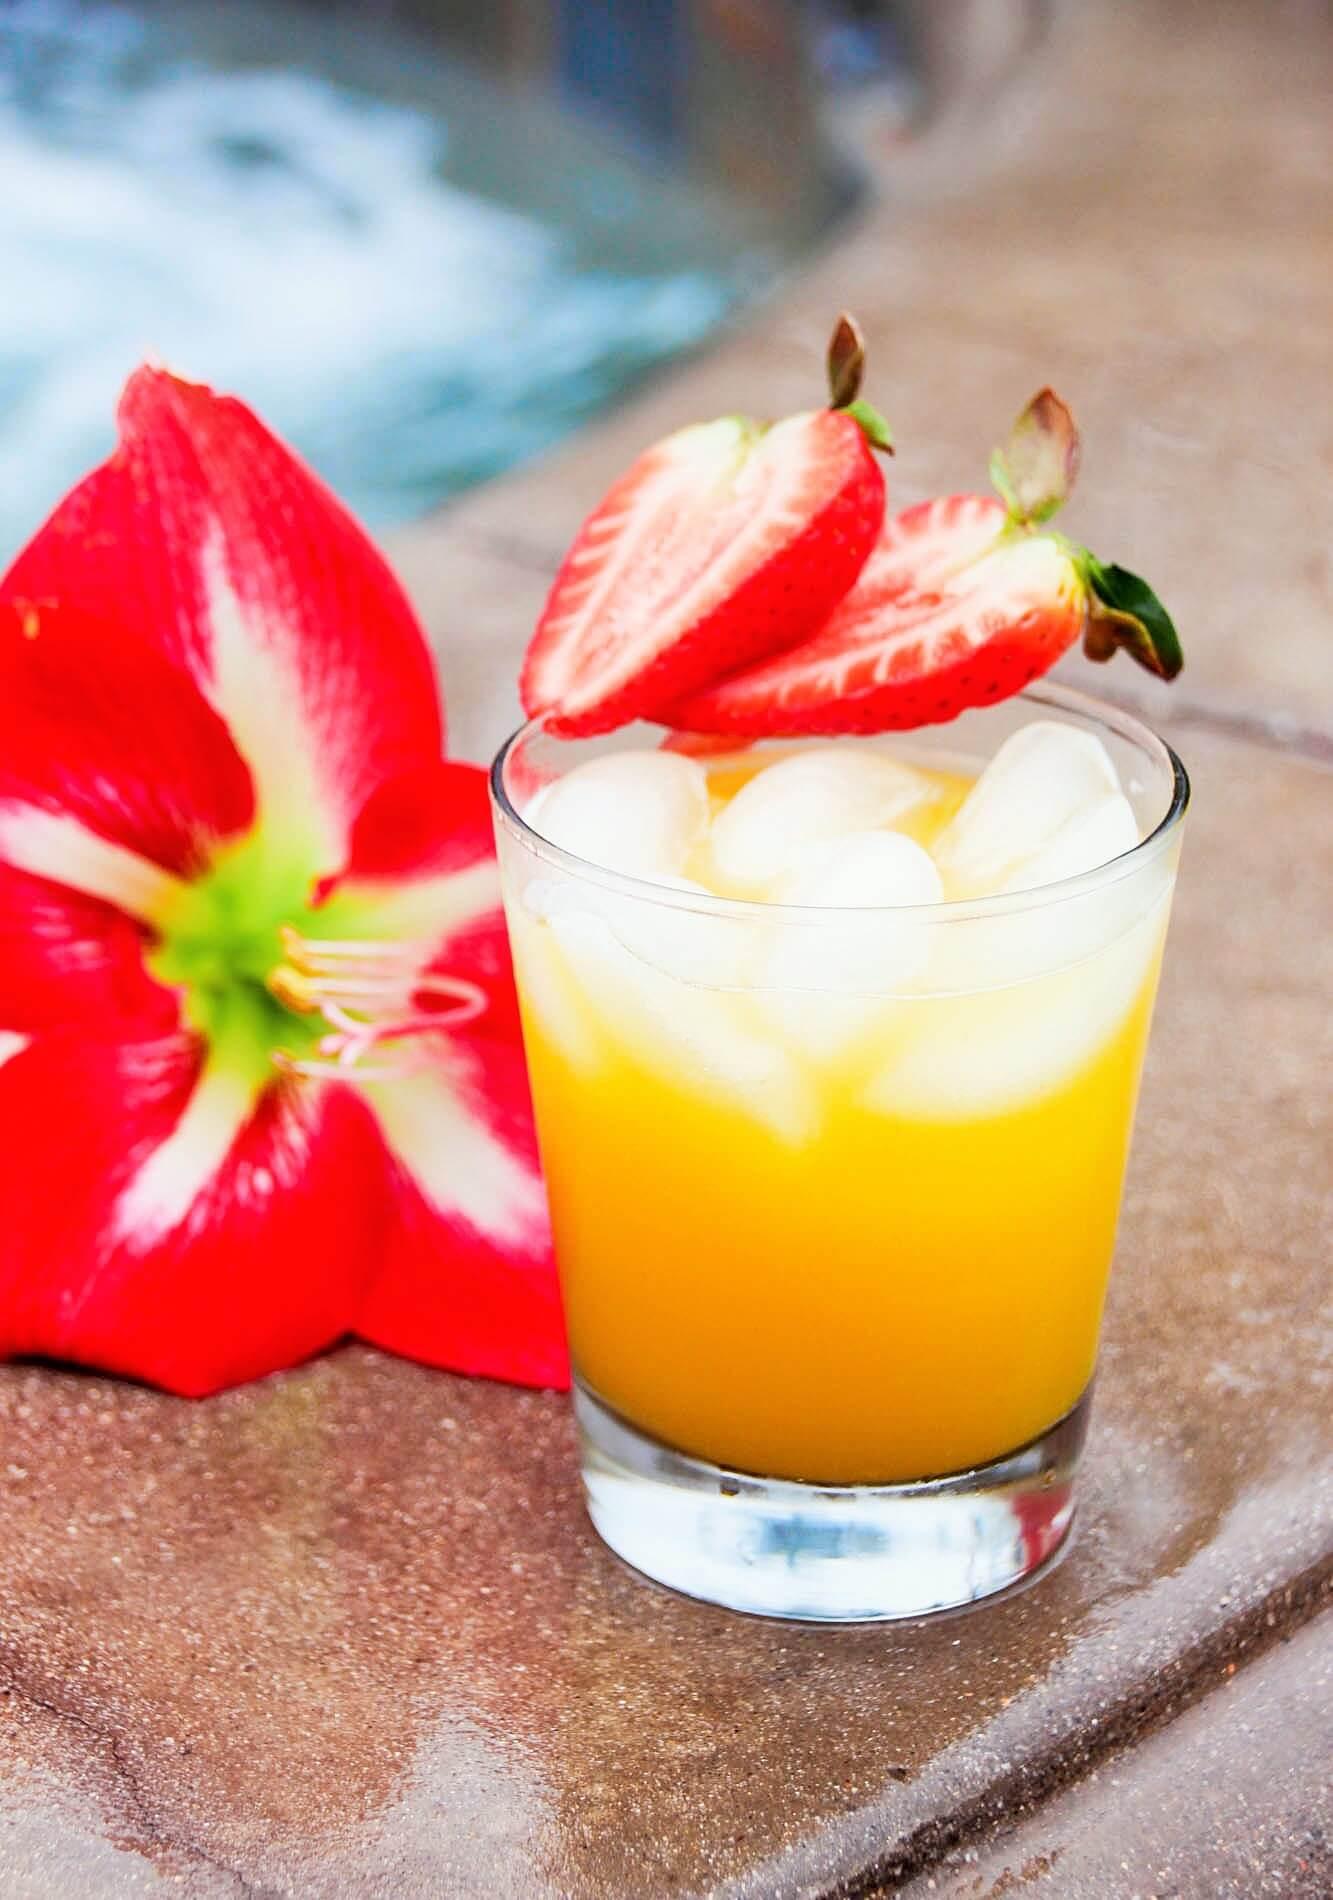 Strawberry & Mango Tequila Punch Recipe